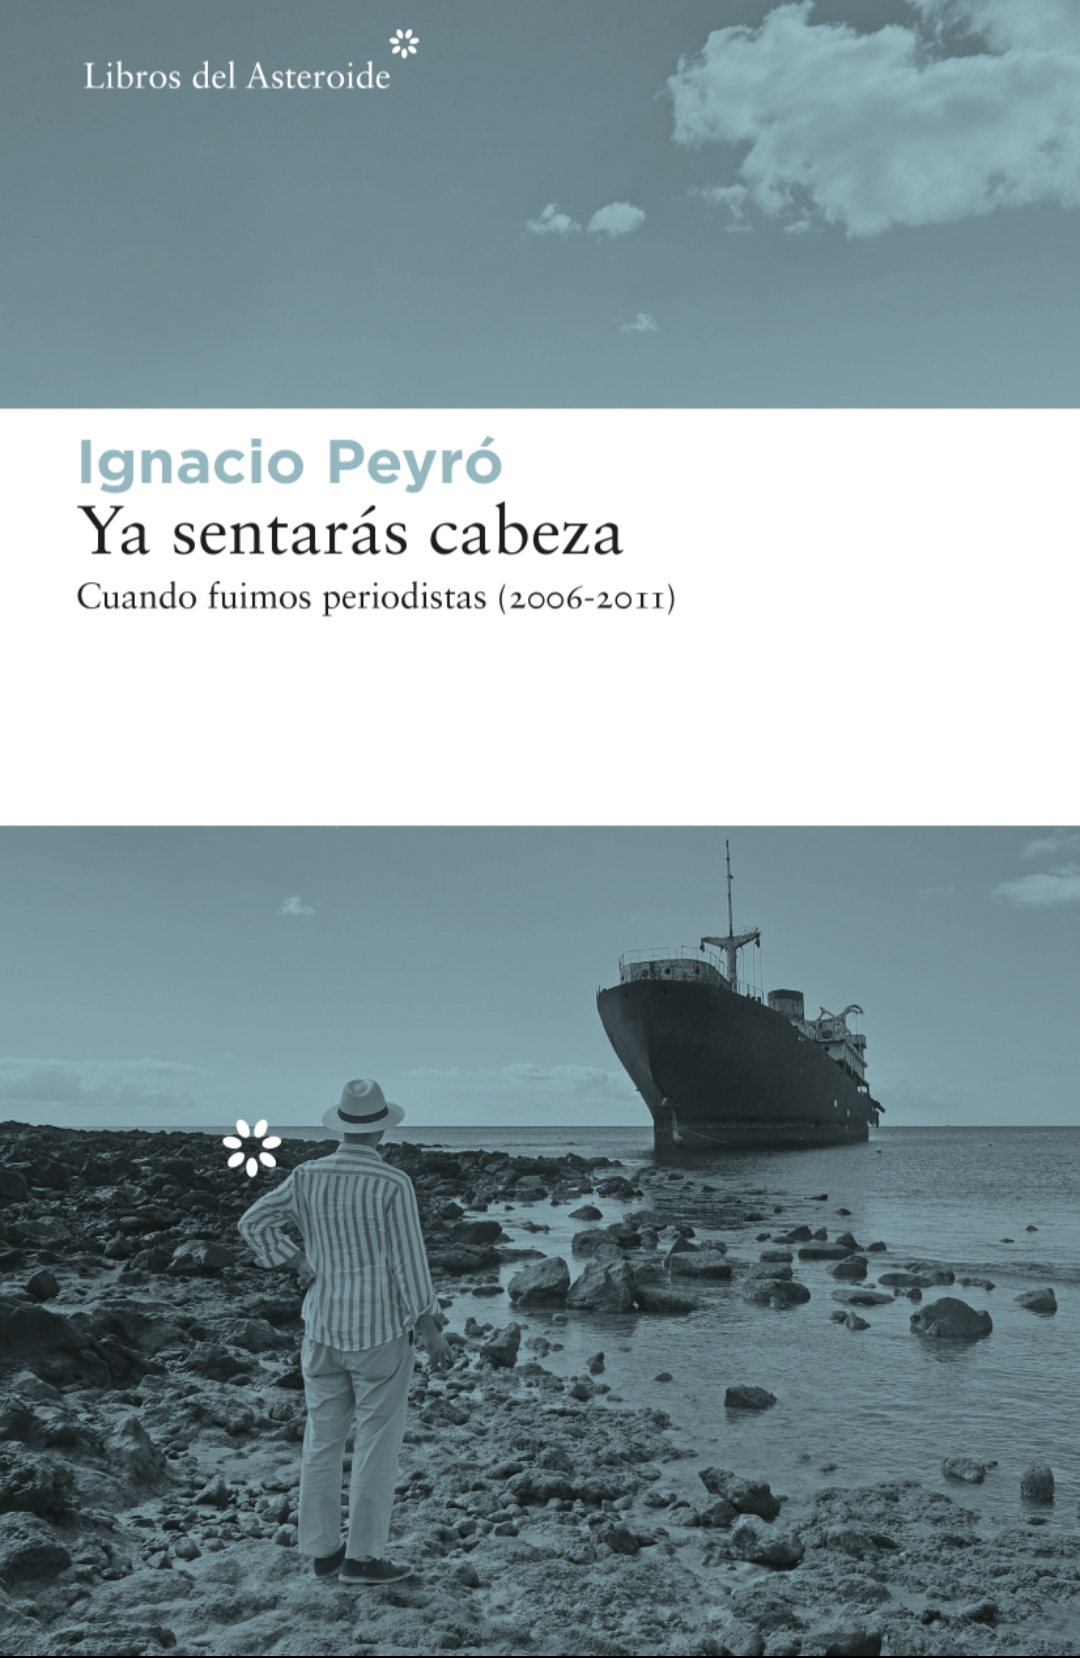 Libro de Ignacio Peyró